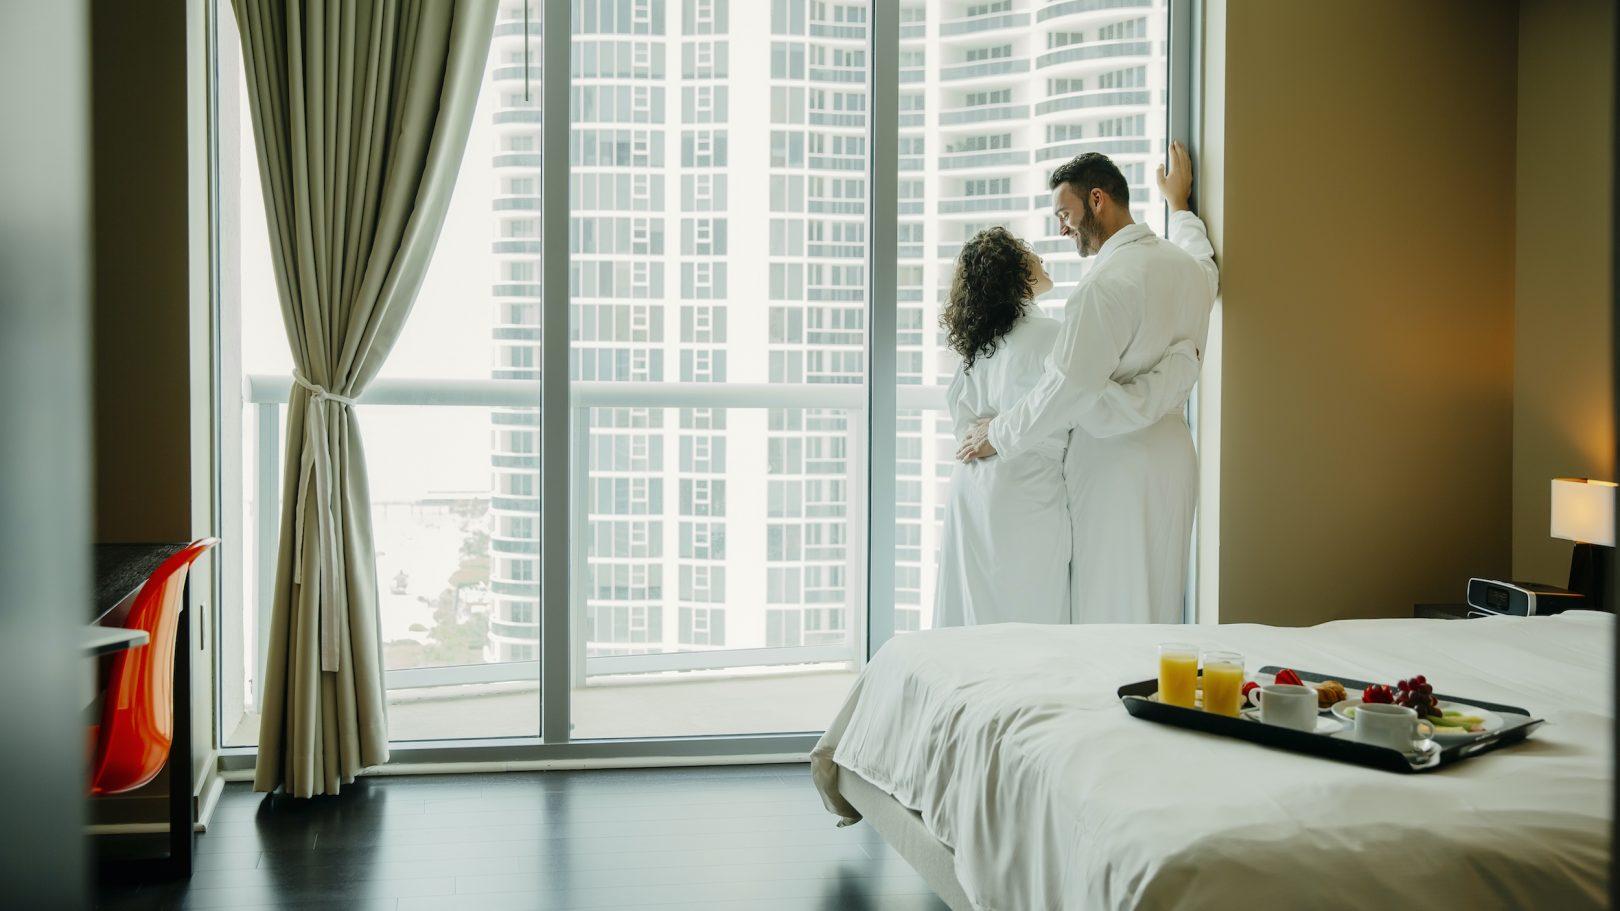 myvegas slots free hotel room